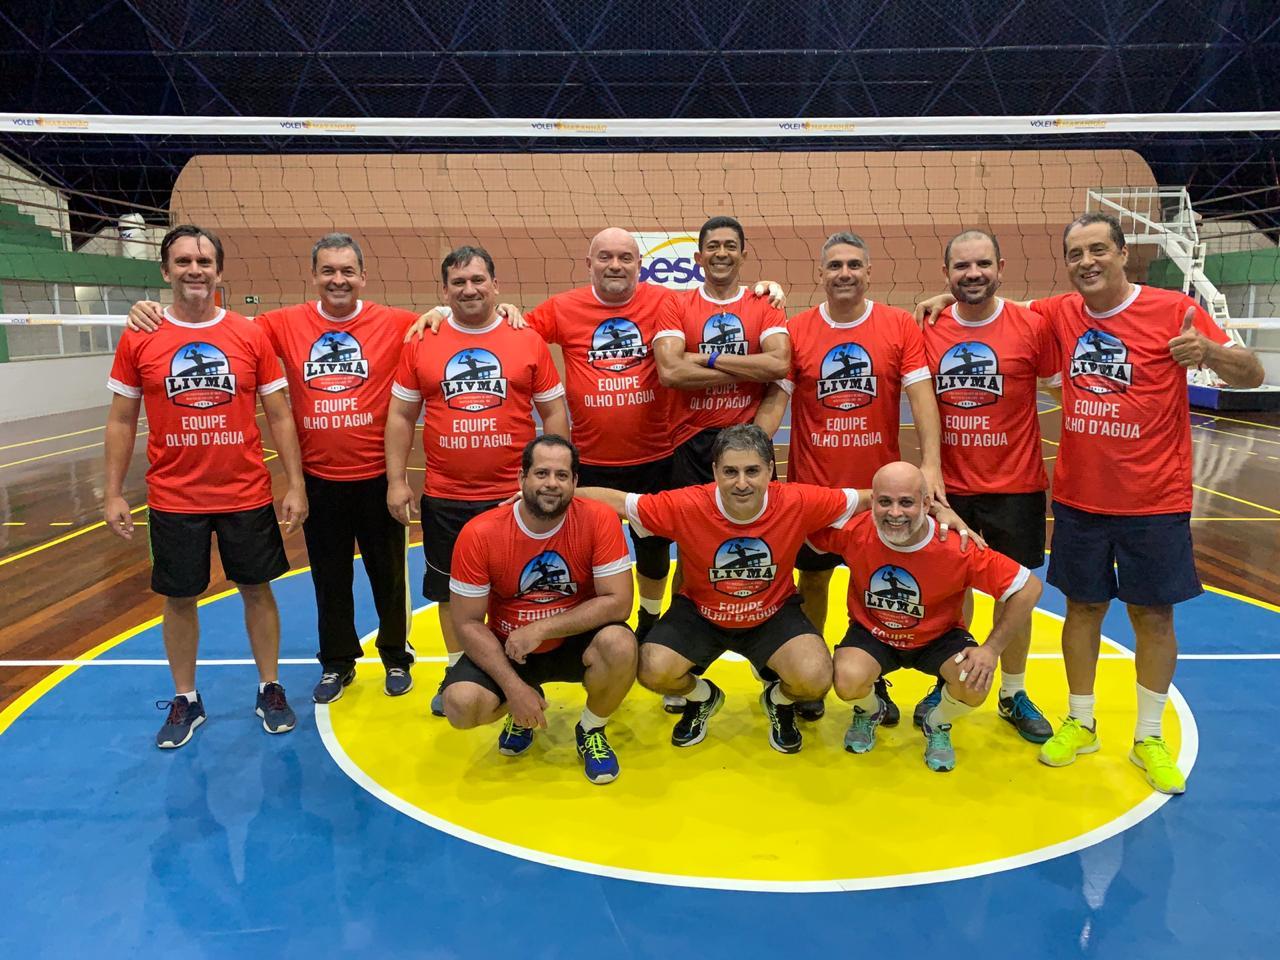 Rodada definiu as Semifinais do Master de Voleibol